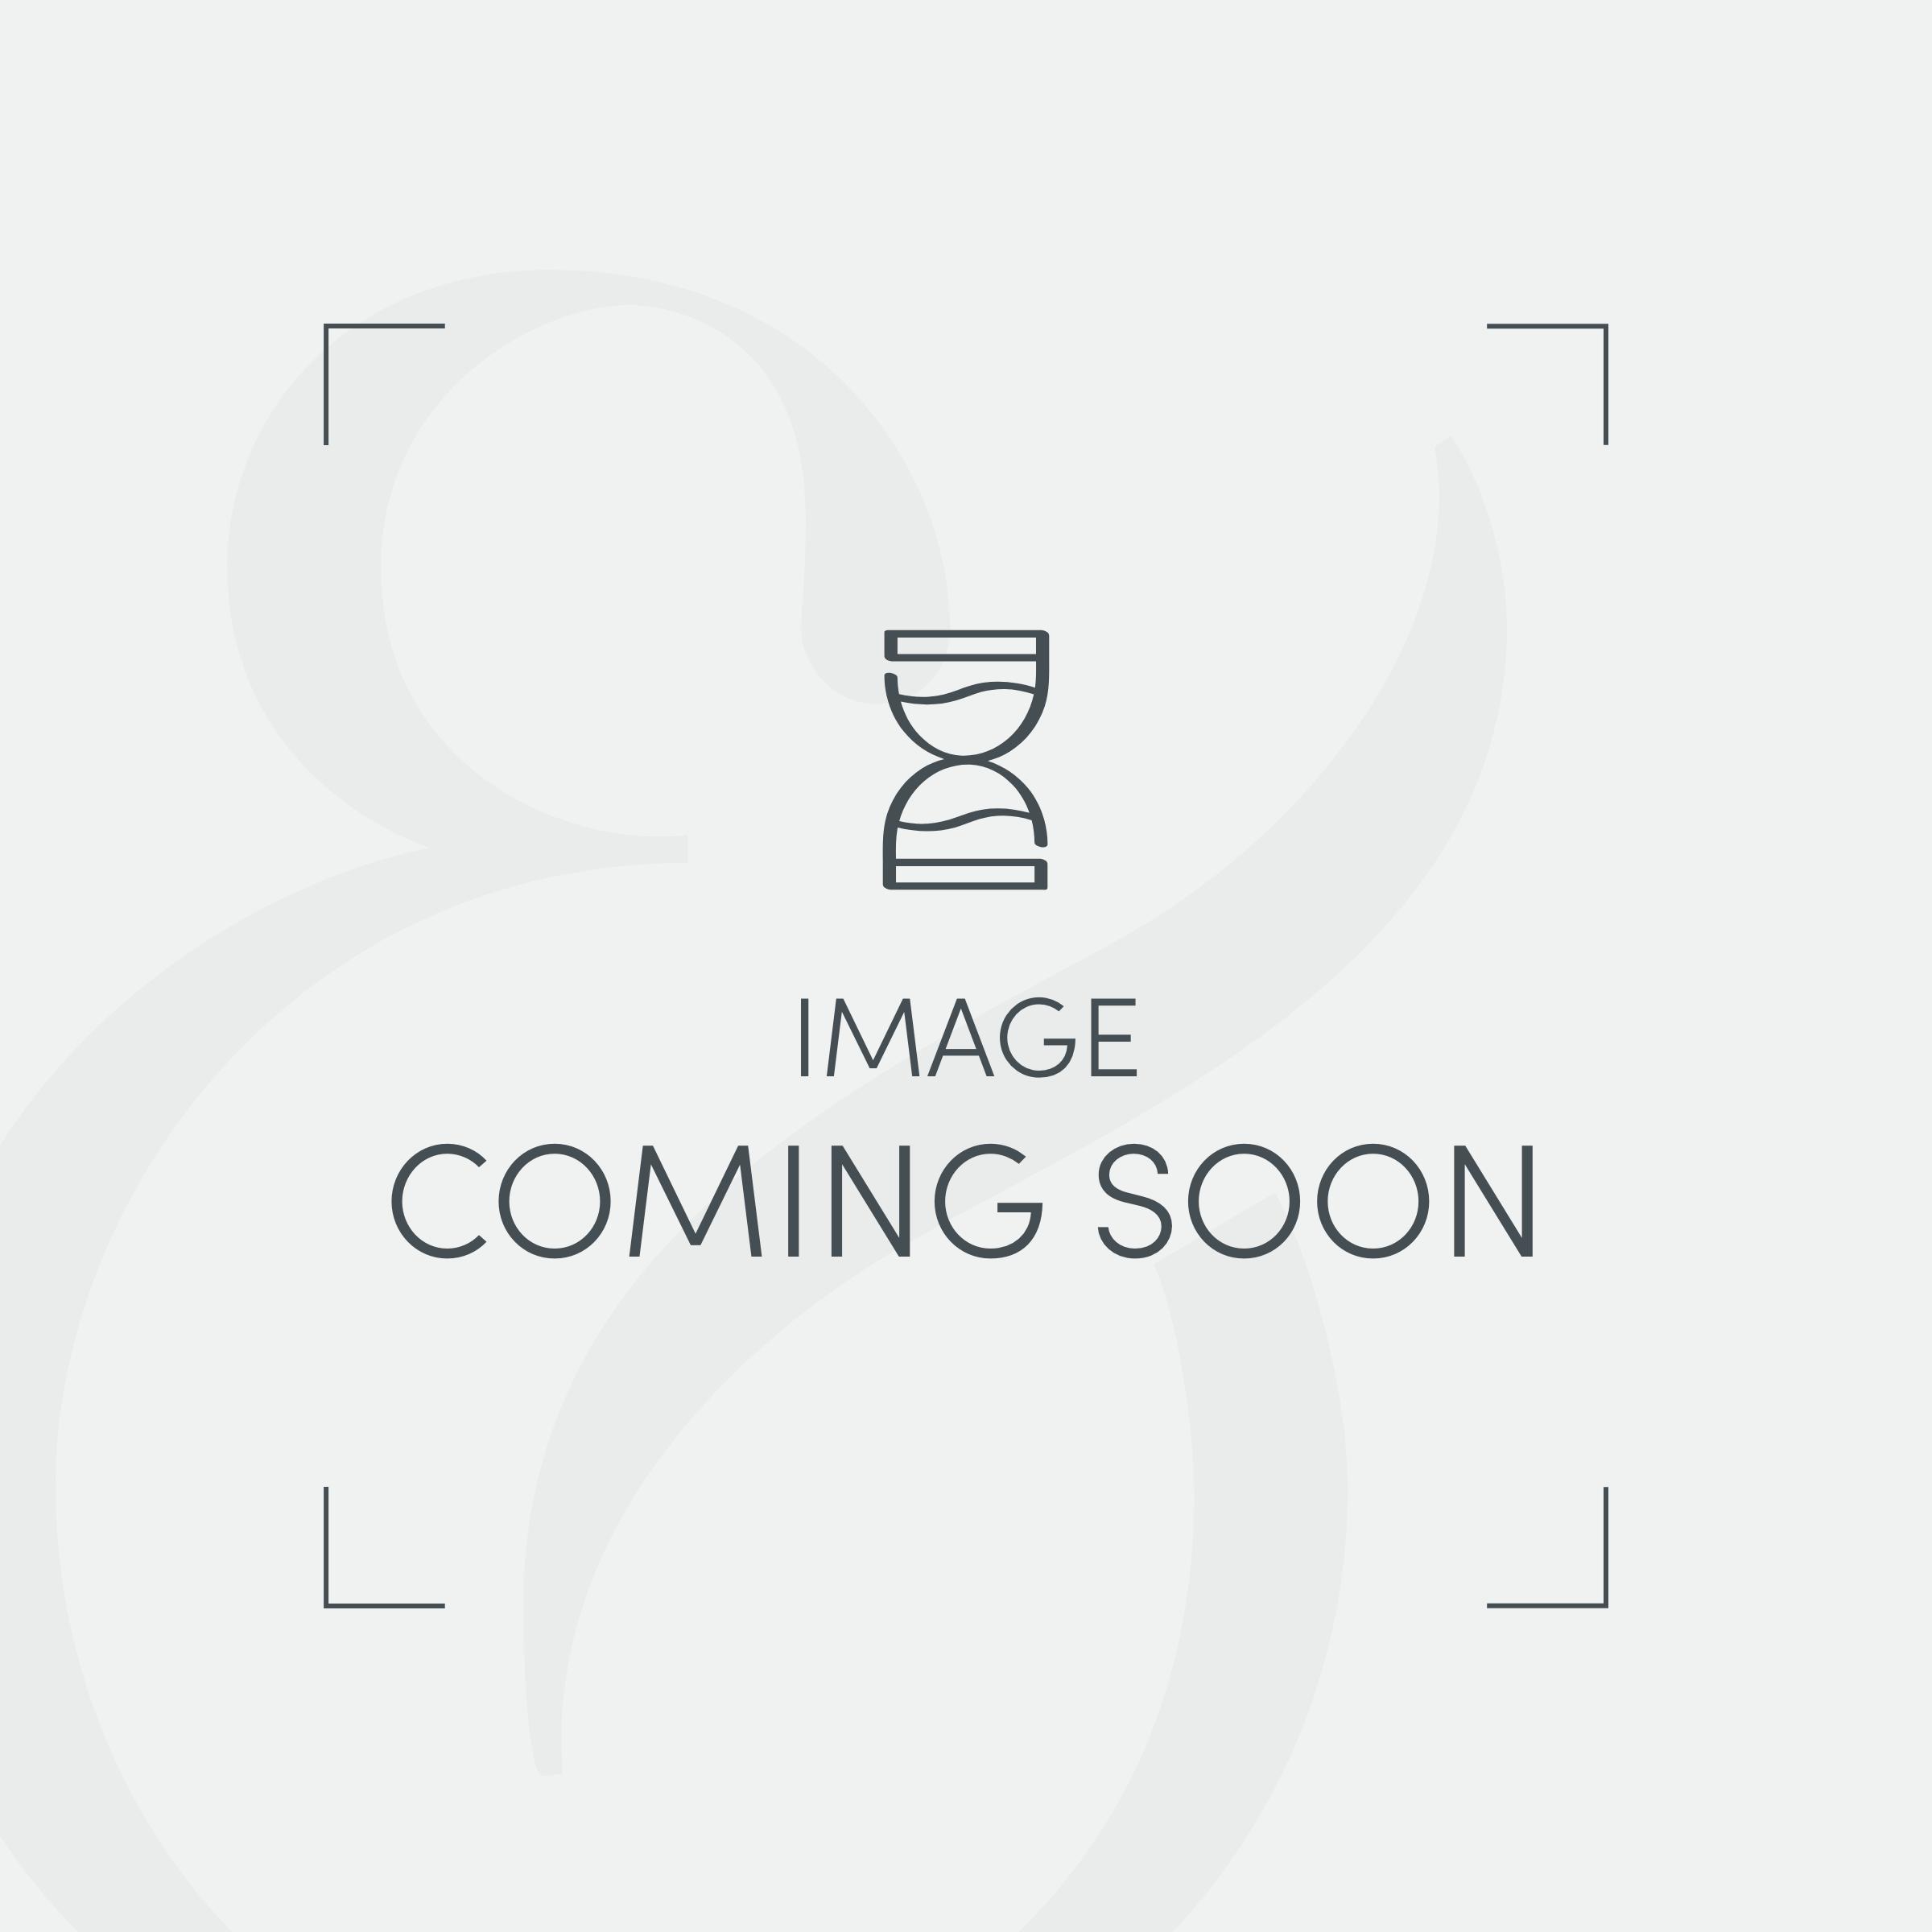 High Summer Warmth New Zealand Wool Cot Bed Duvet and Pillow Set